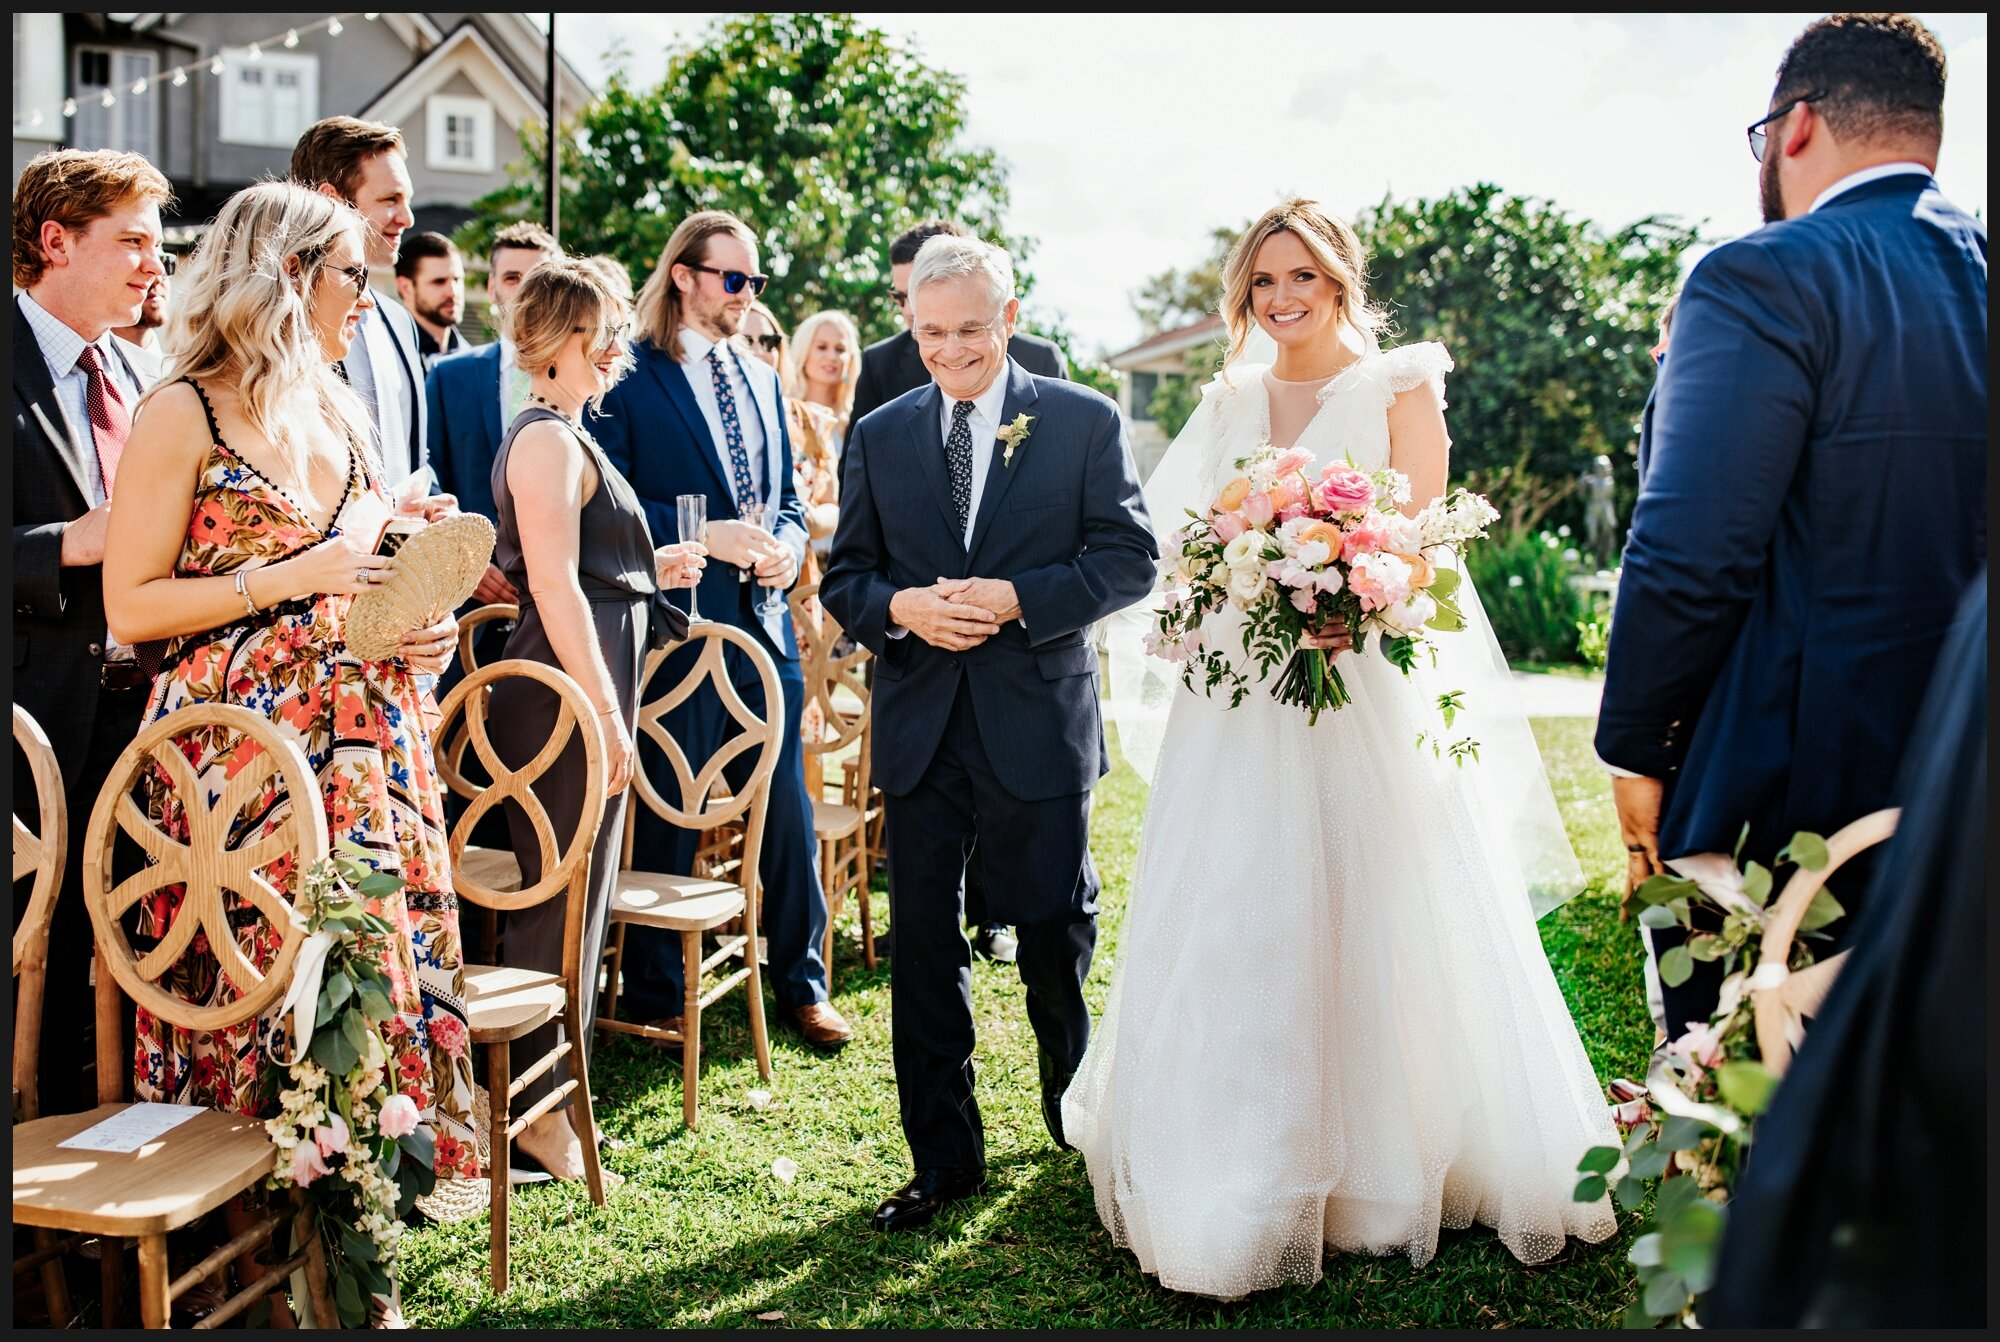 Orlando-Wedding-Photographer-destination-wedding-photographer-florida-wedding-photographer-hawaii-wedding-photographer_0753.jpg